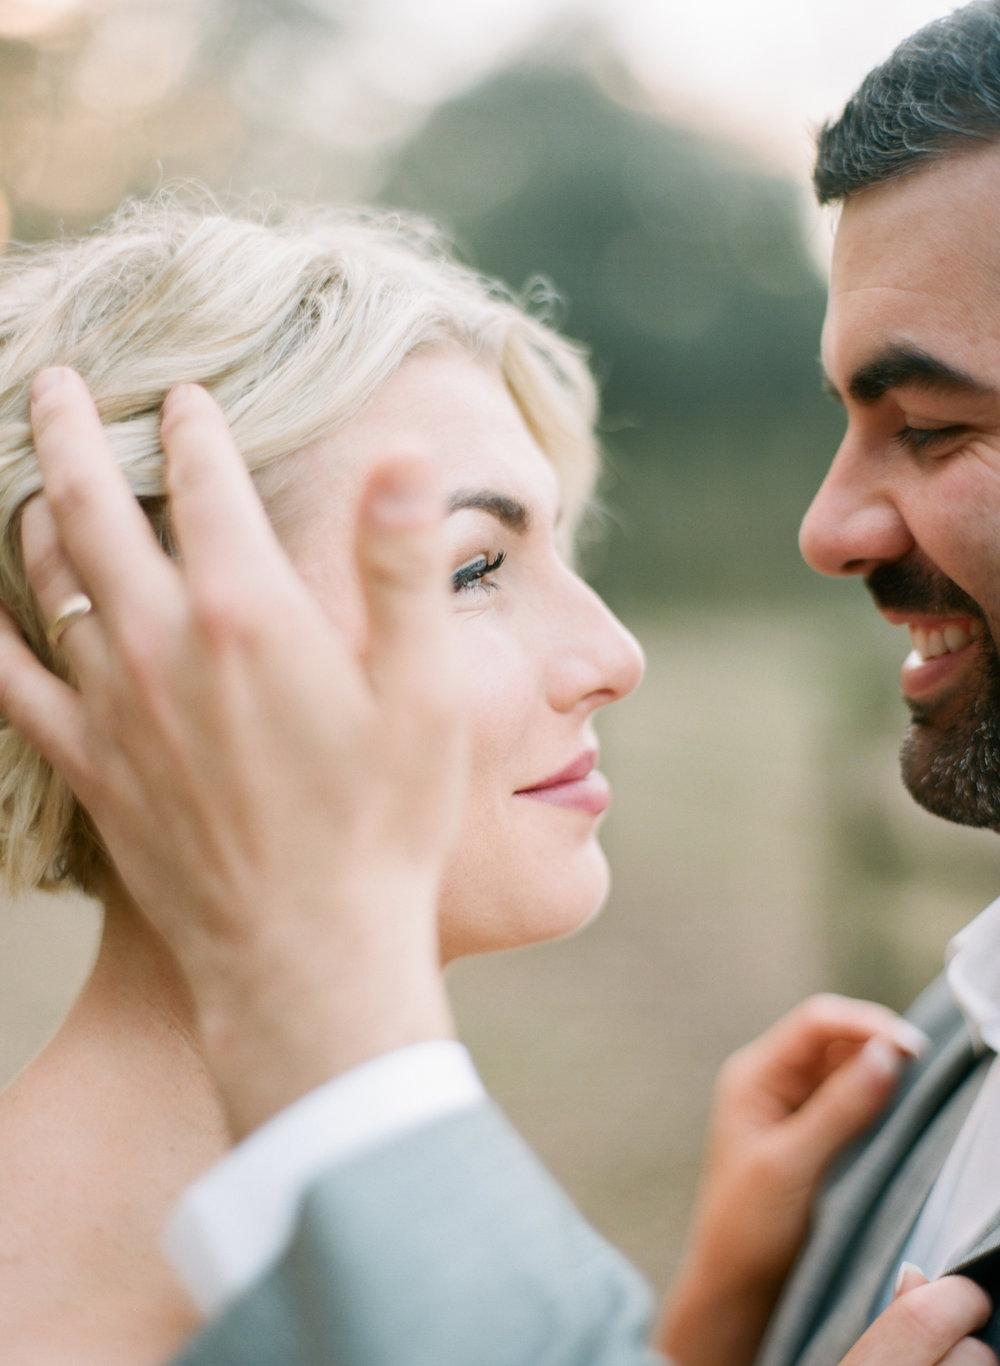 sarah-beth-and-brandon-thomasville-wedding-film-photographer-shannon-griffin-137.jpg